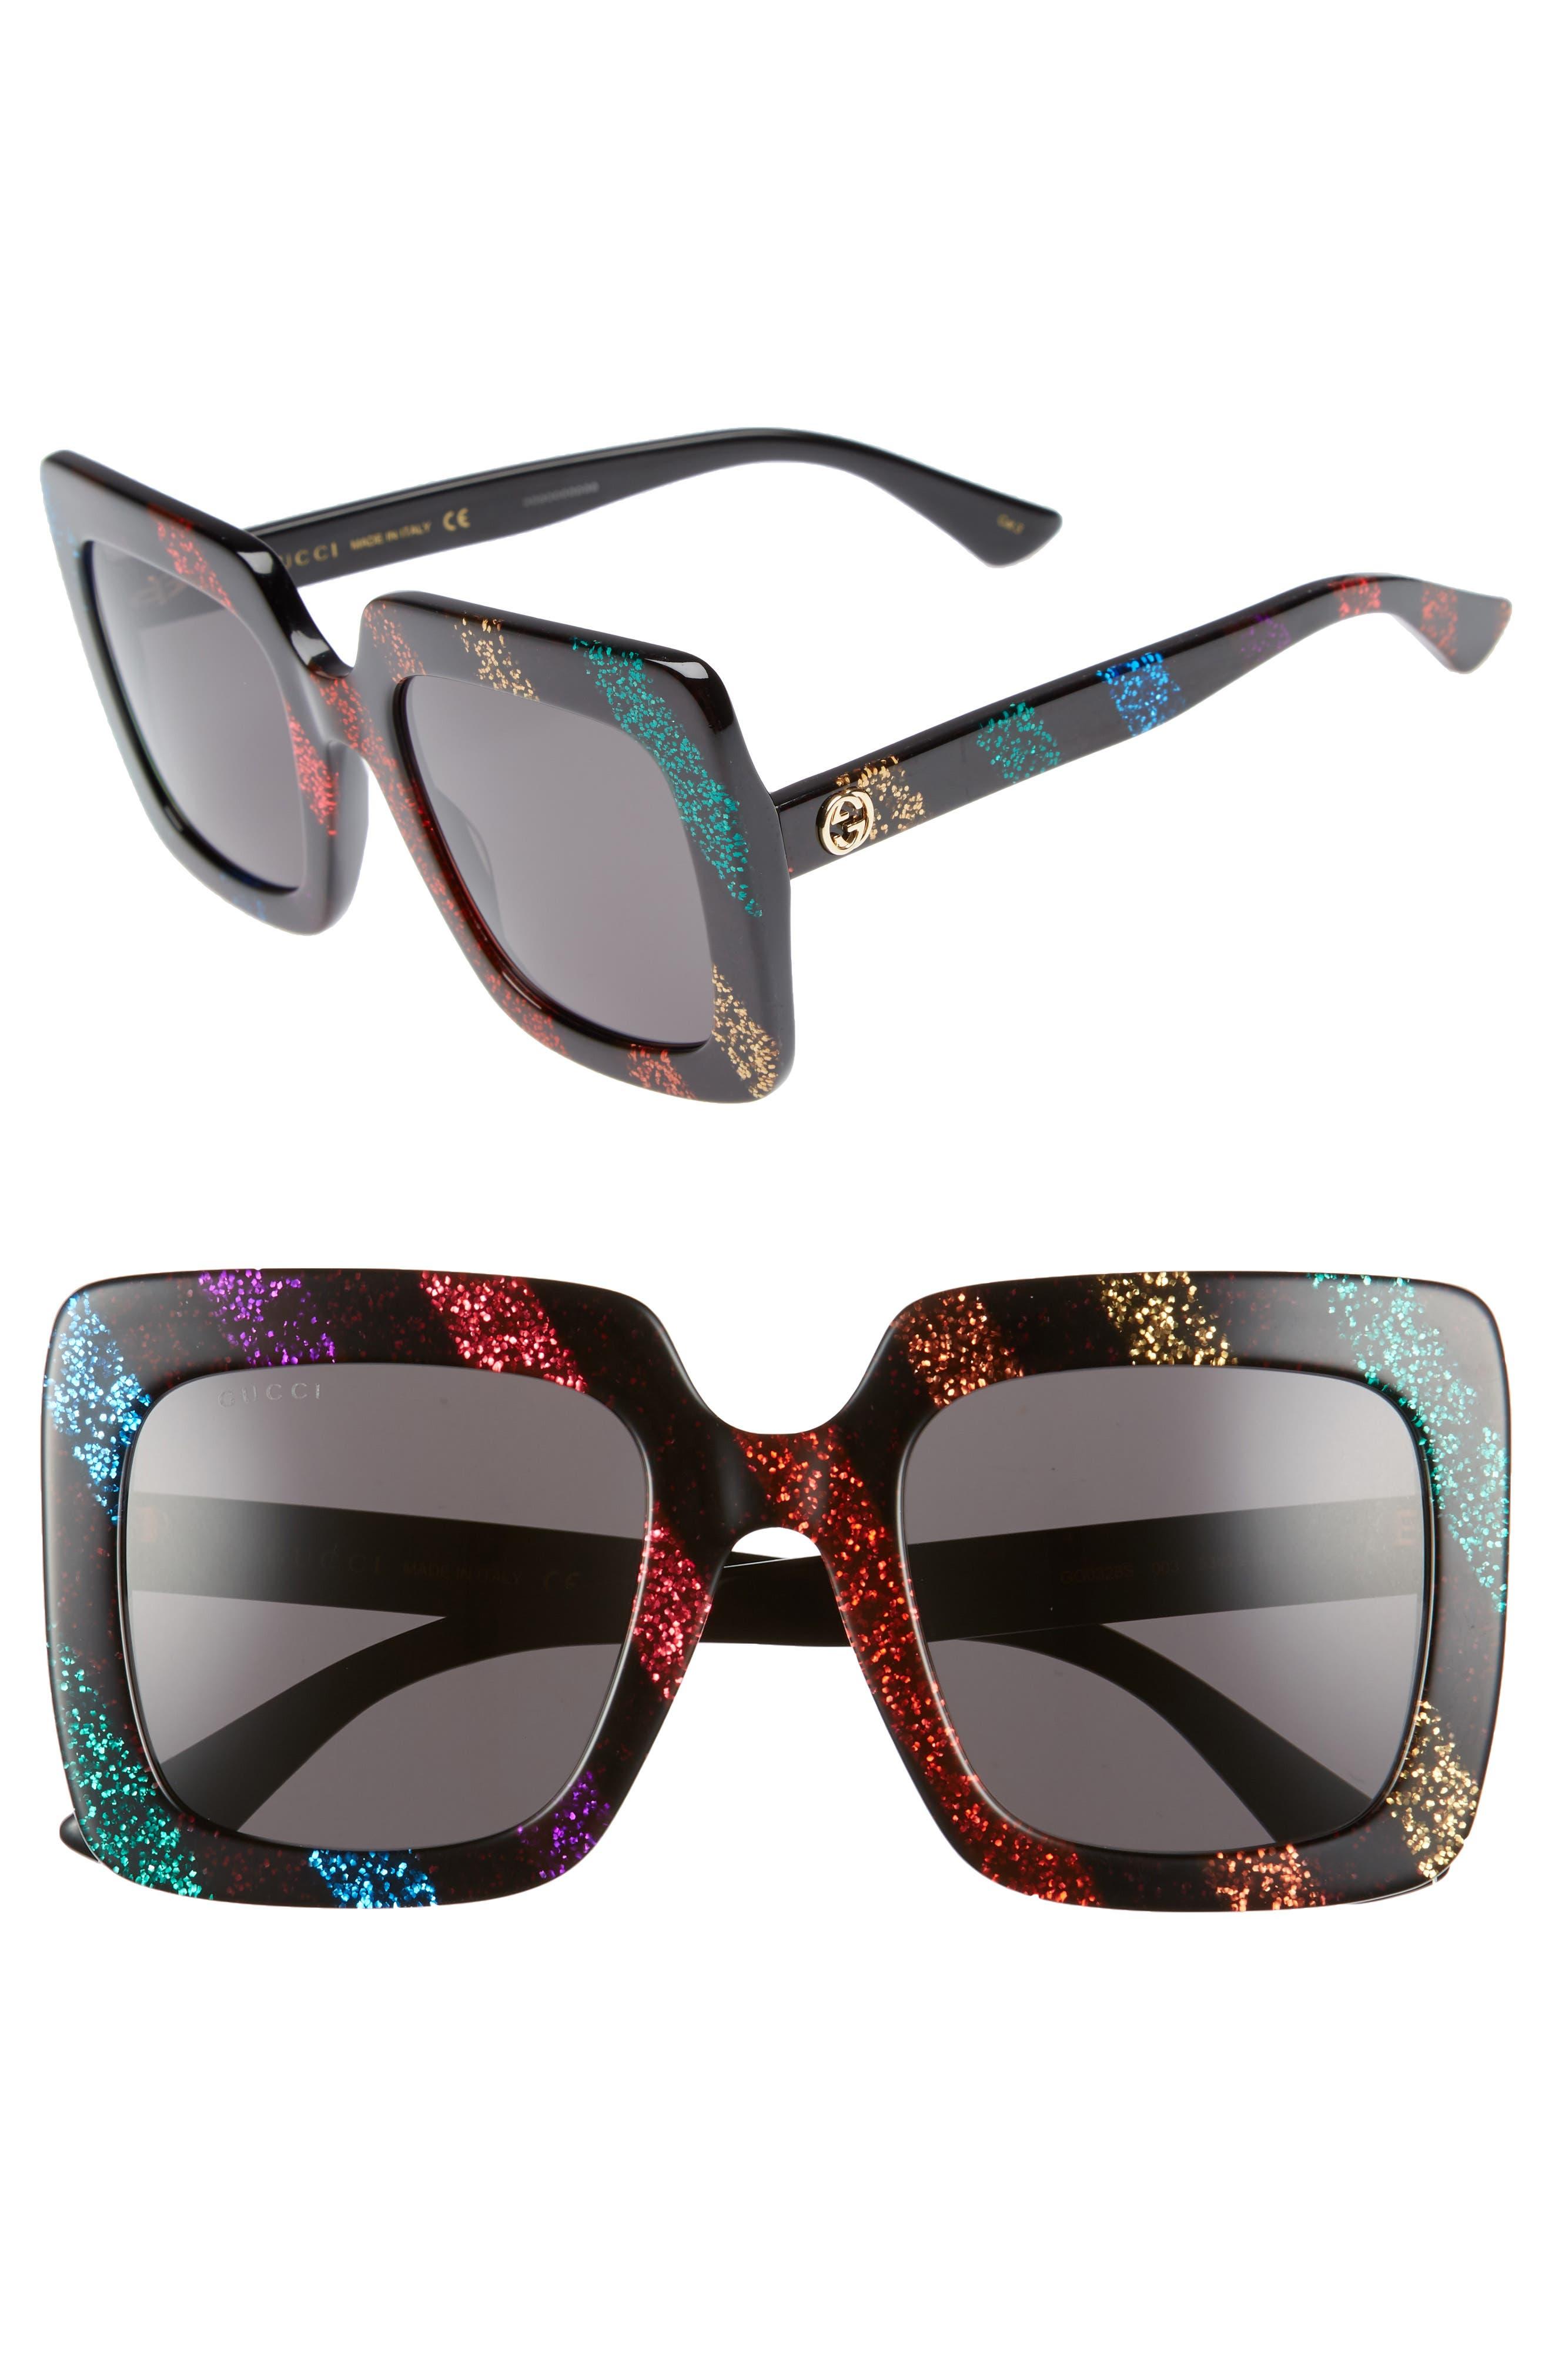 53mm Glitter Stripe Square Sunglasses,                             Main thumbnail 1, color,                             RAINBOW